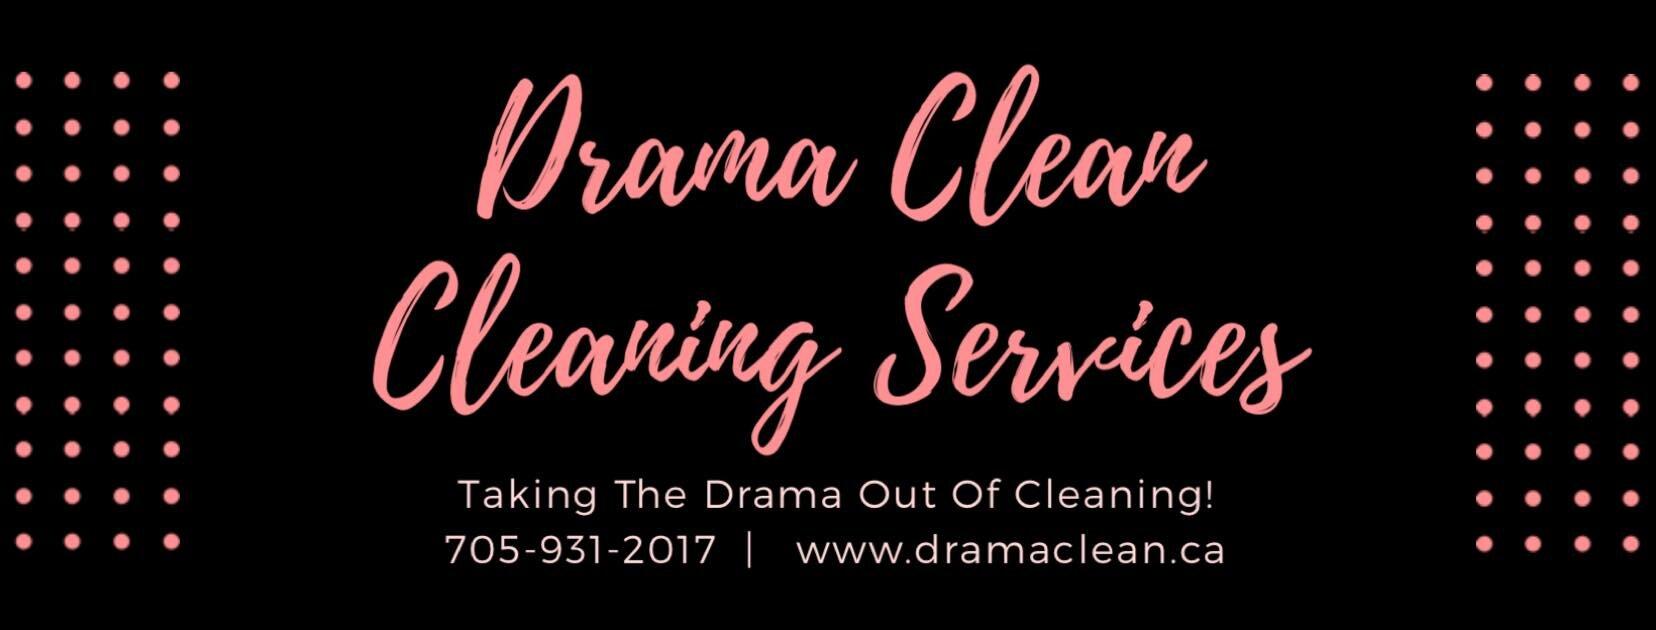 drama clean logo.jpg